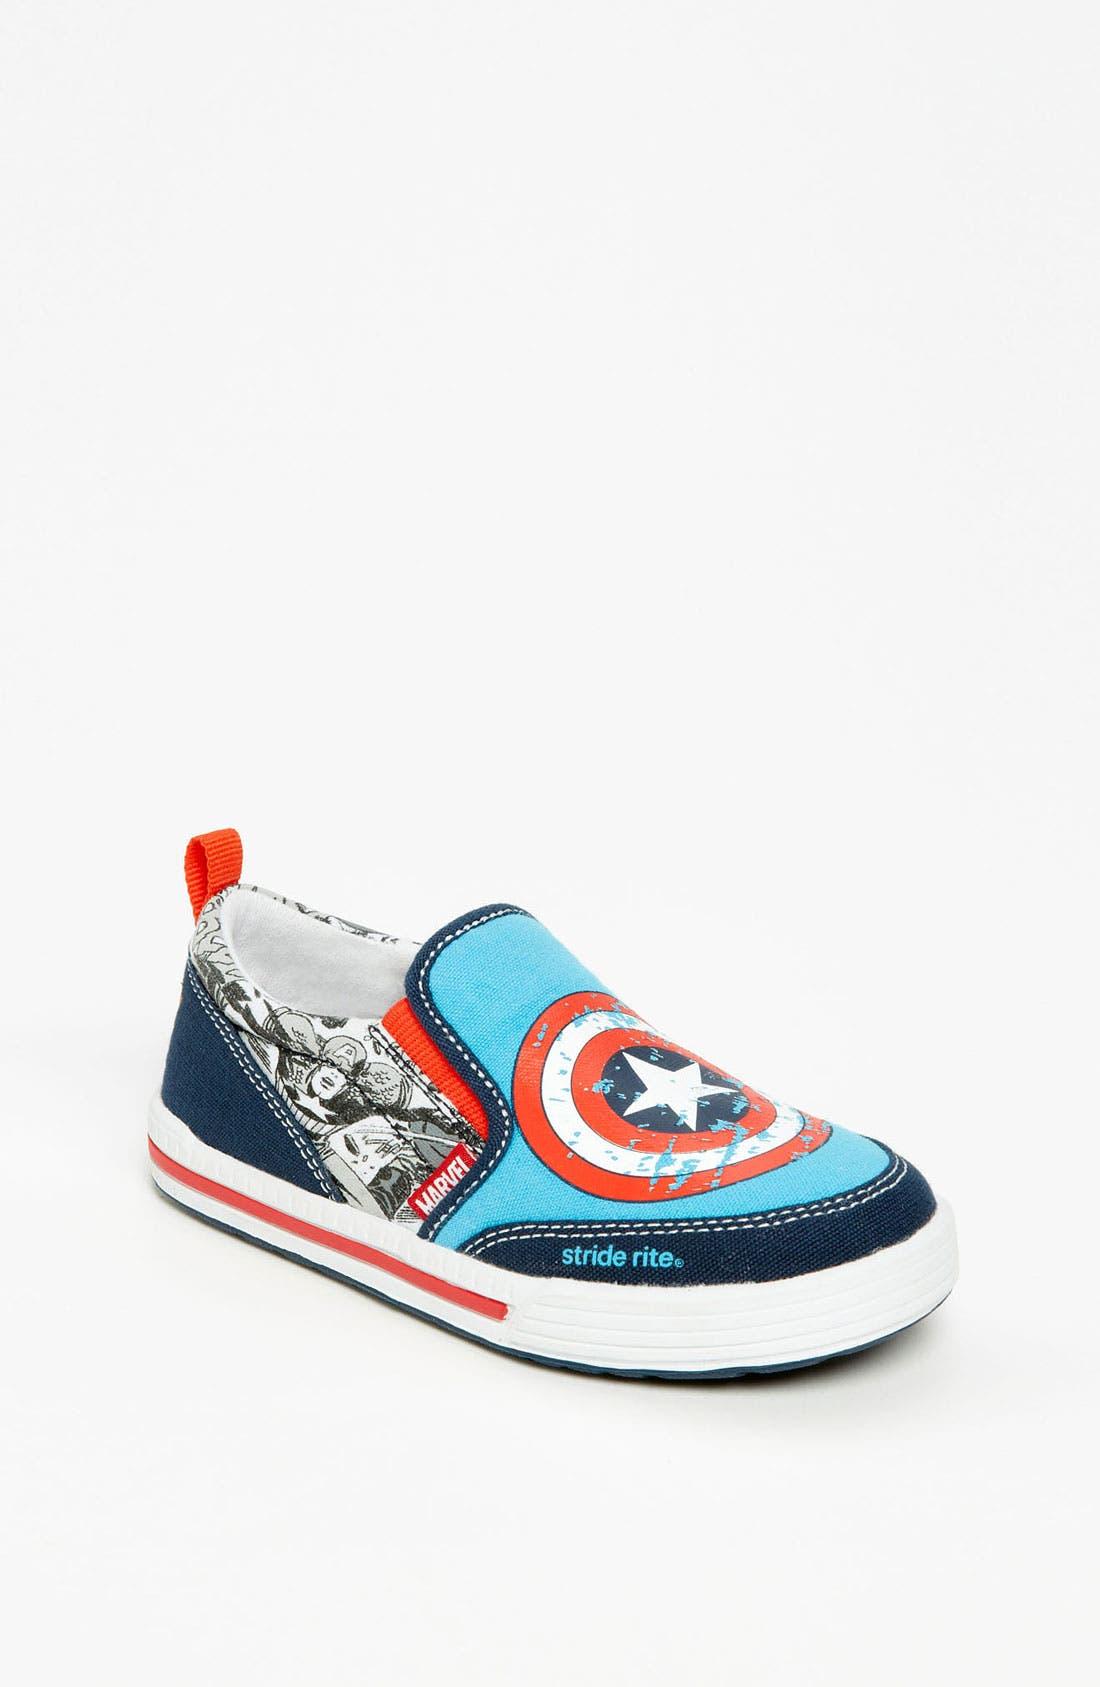 Main Image - Stride Rite 'Captain America™' Sneaker (Toddler)